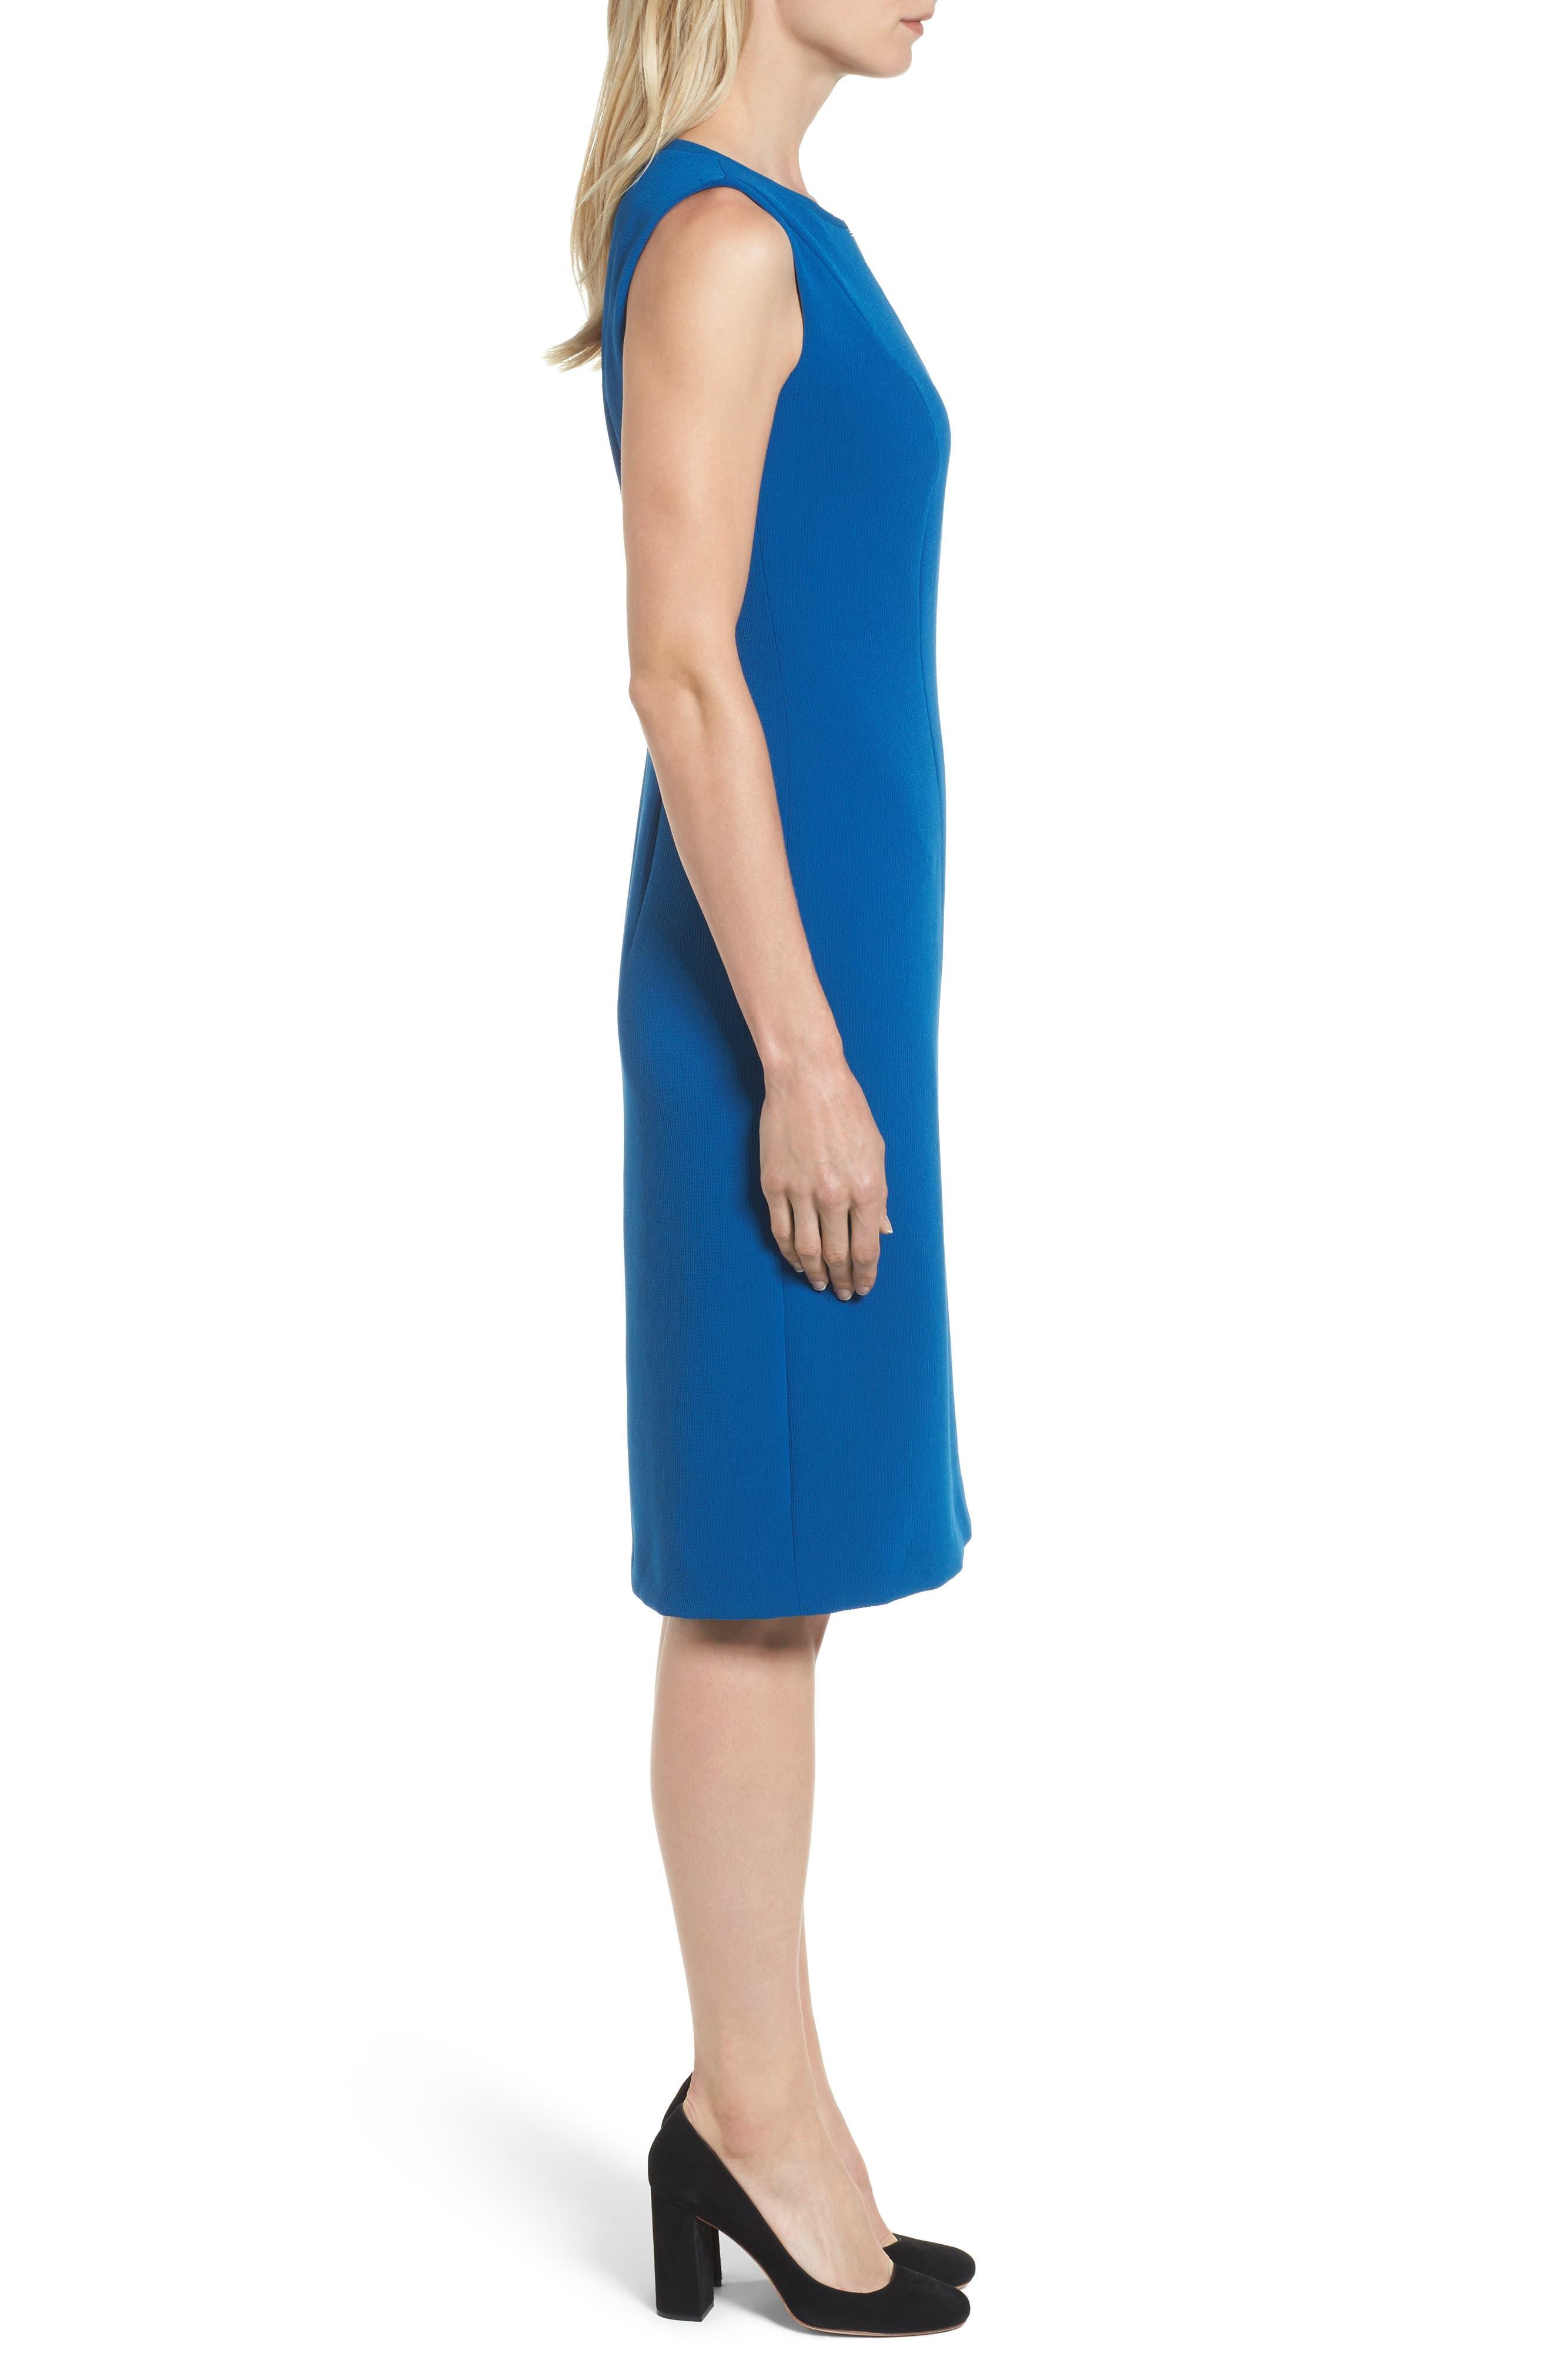 Danafea Zip Detail Sheath Dress,                             Alternate thumbnail 3, color,                             424